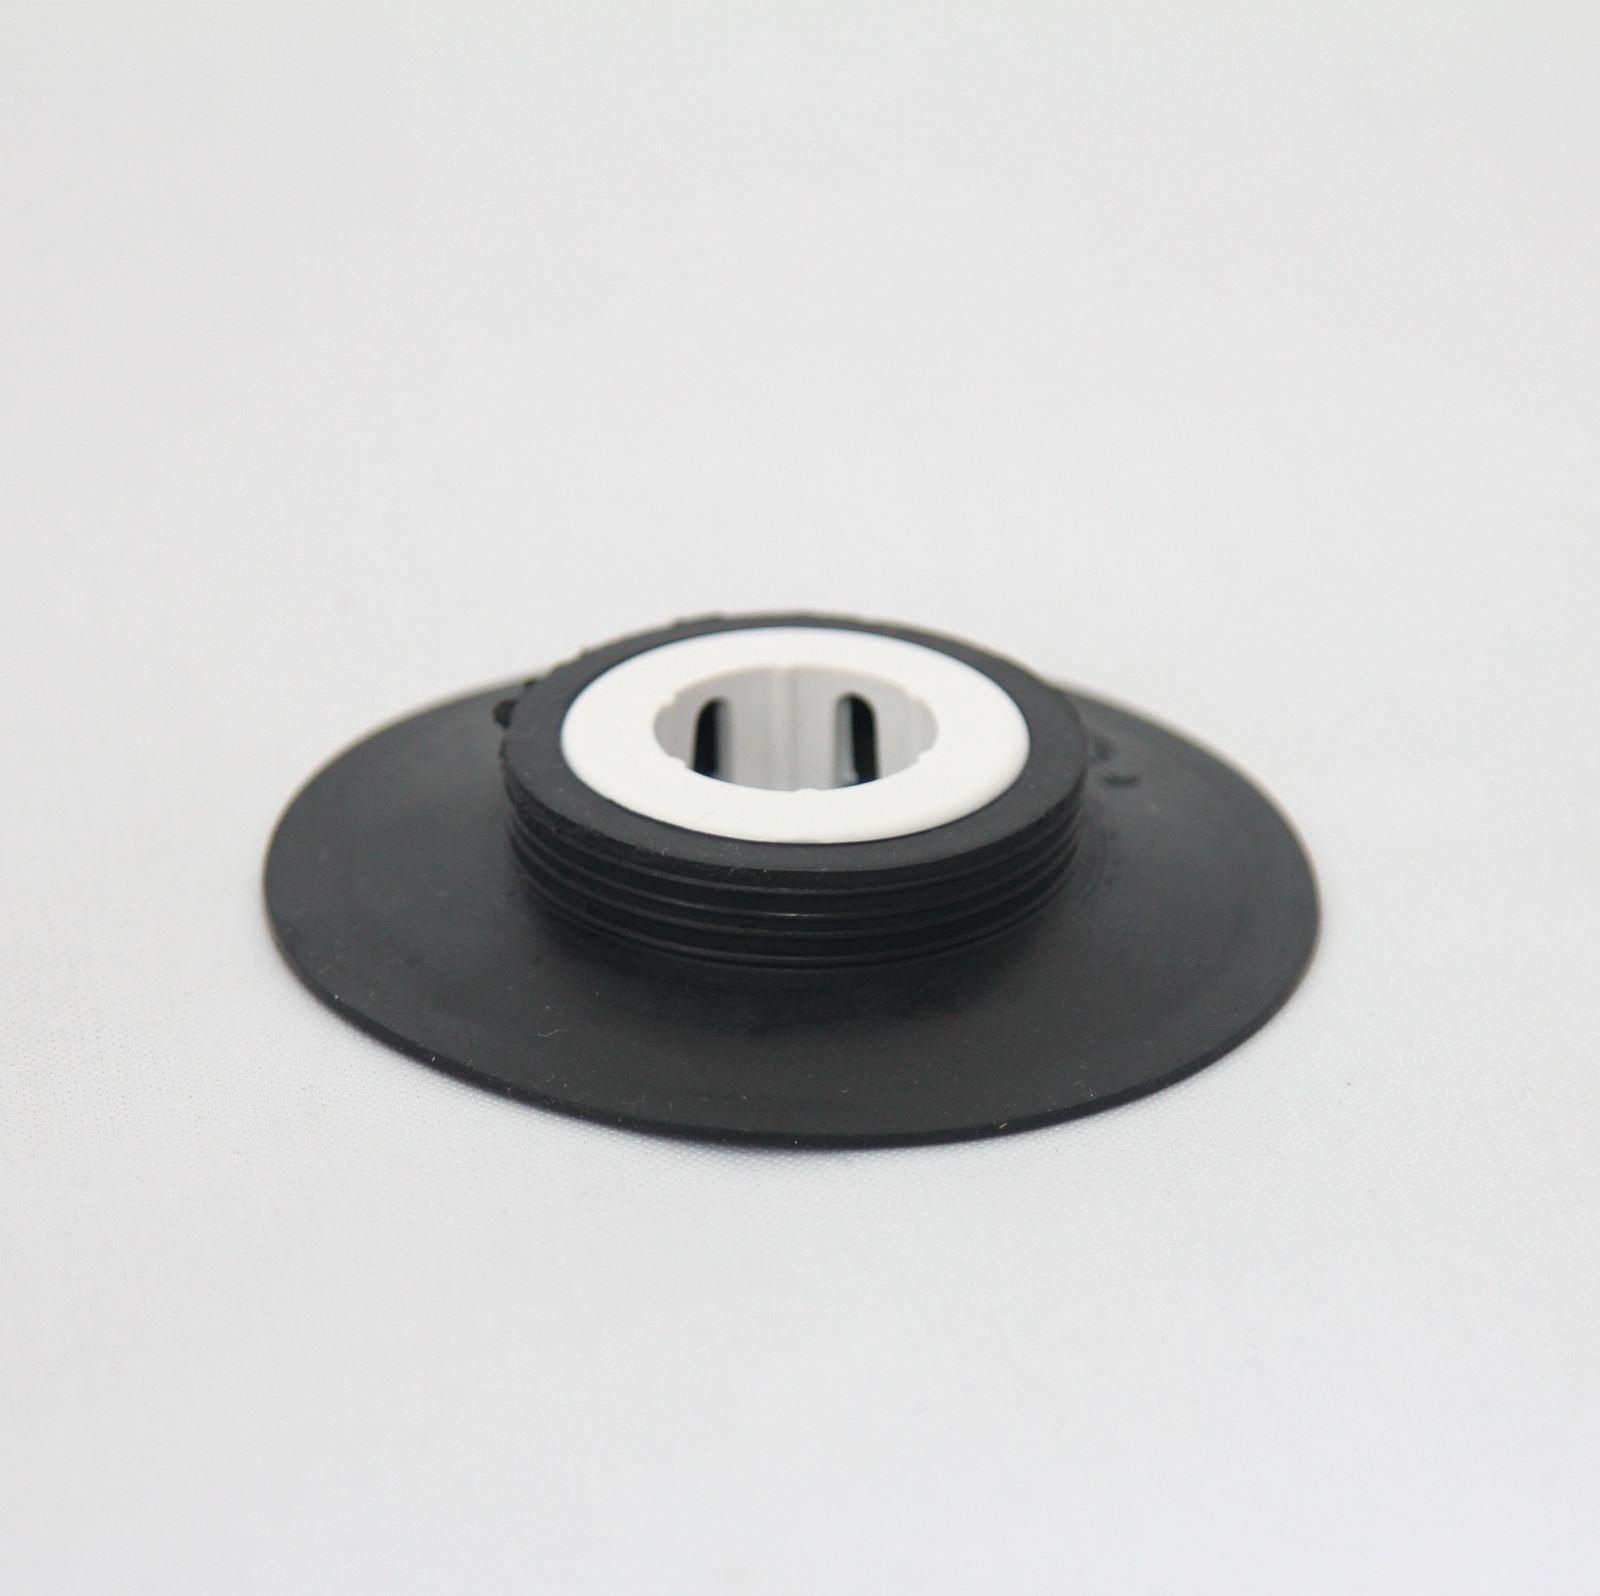 Ideal Standard Sv01967 Dual Flush Valve Diaphragm Seal